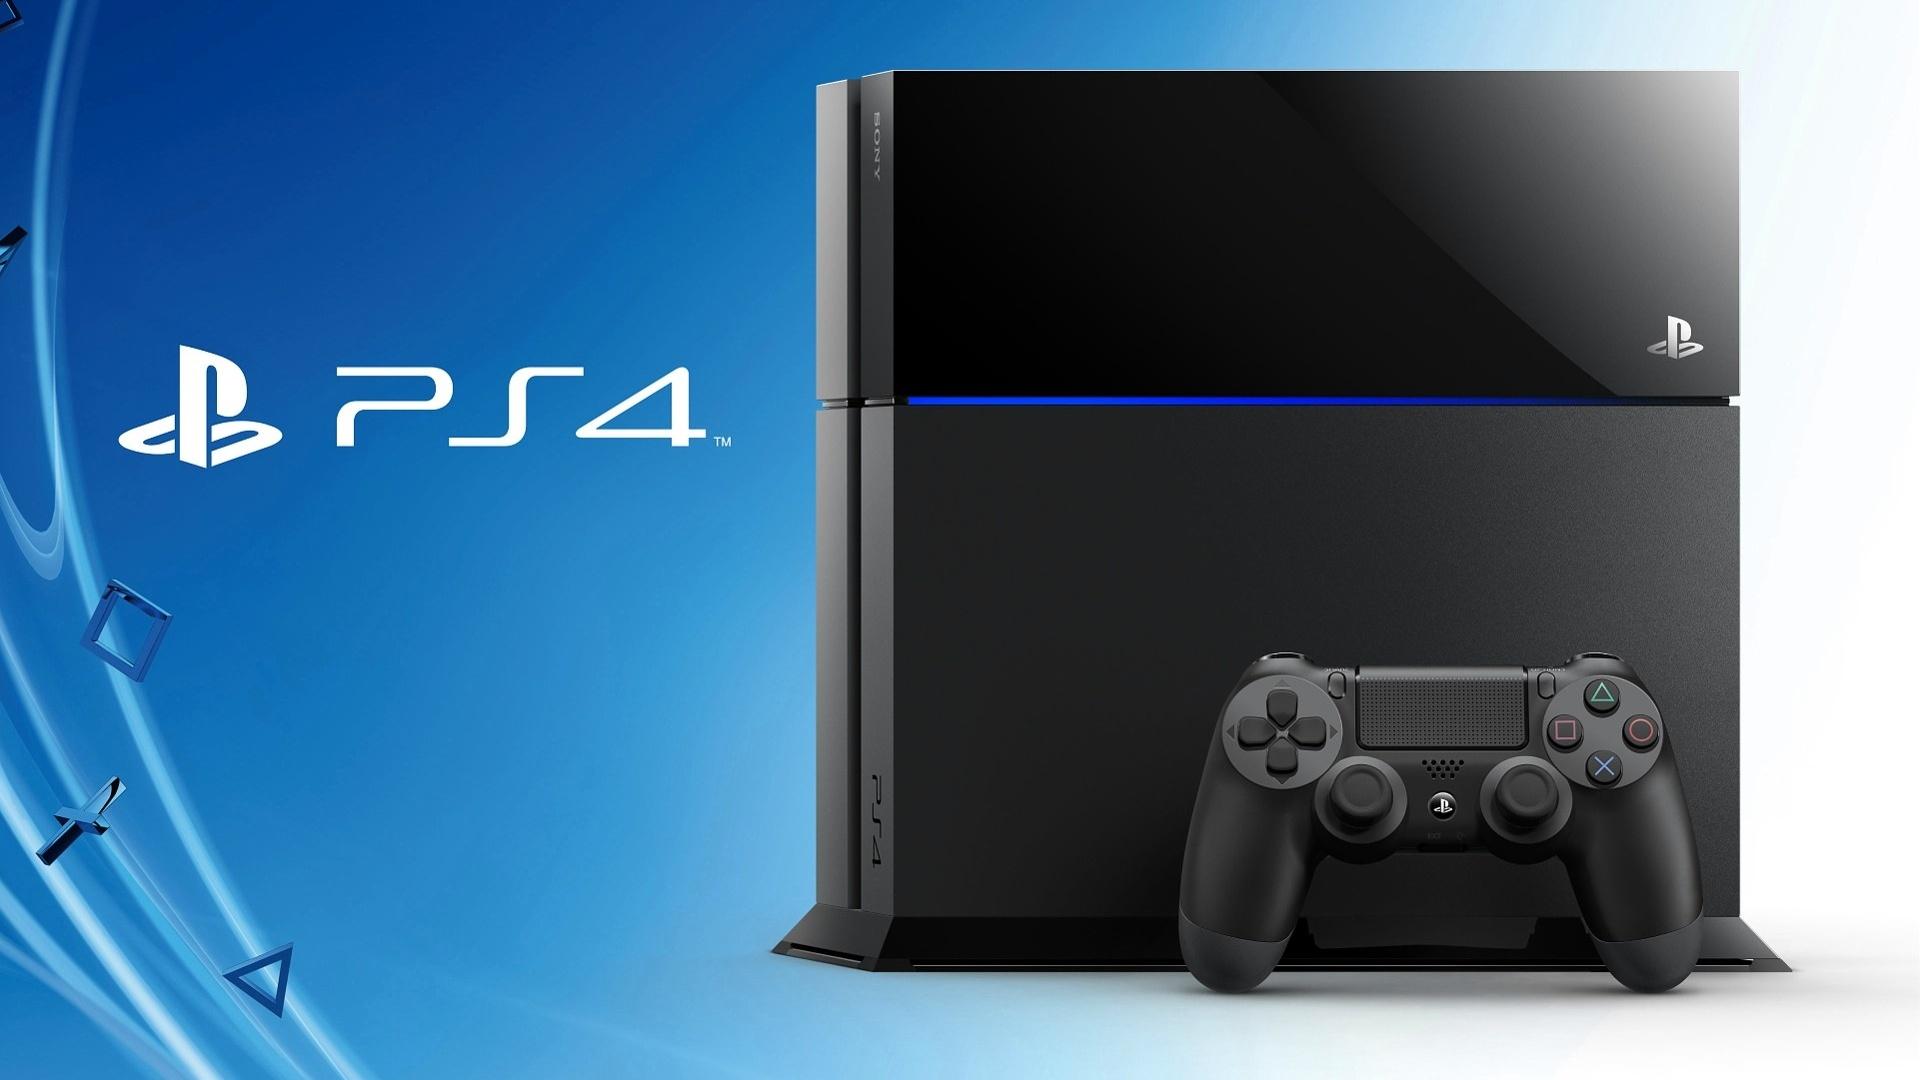 The Playstation 4 emulator, Orbital, supports the DualShock 4 controller, progresses further on Safe Mode